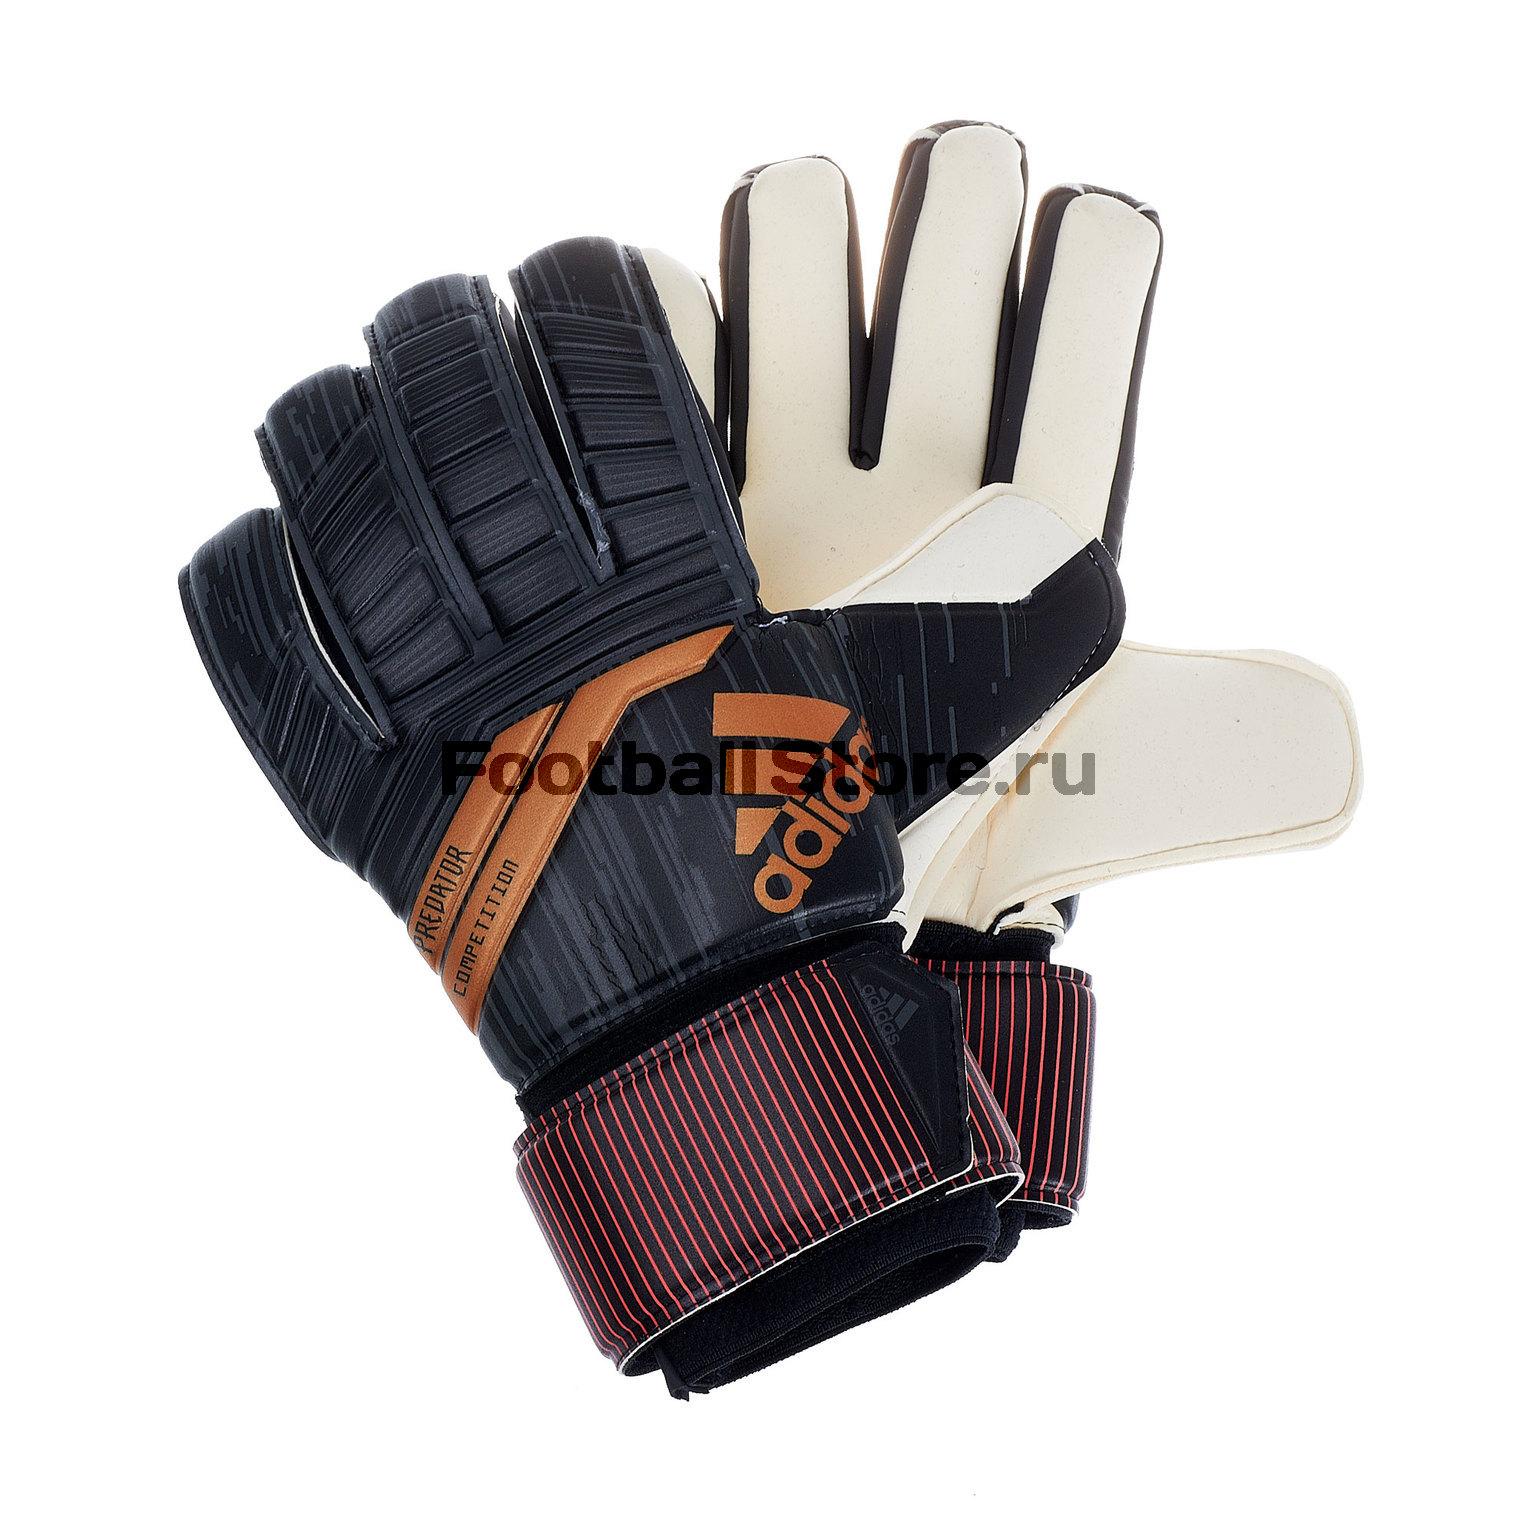 Перчатки вратарские Adidas Pre Competition CF1360 competition